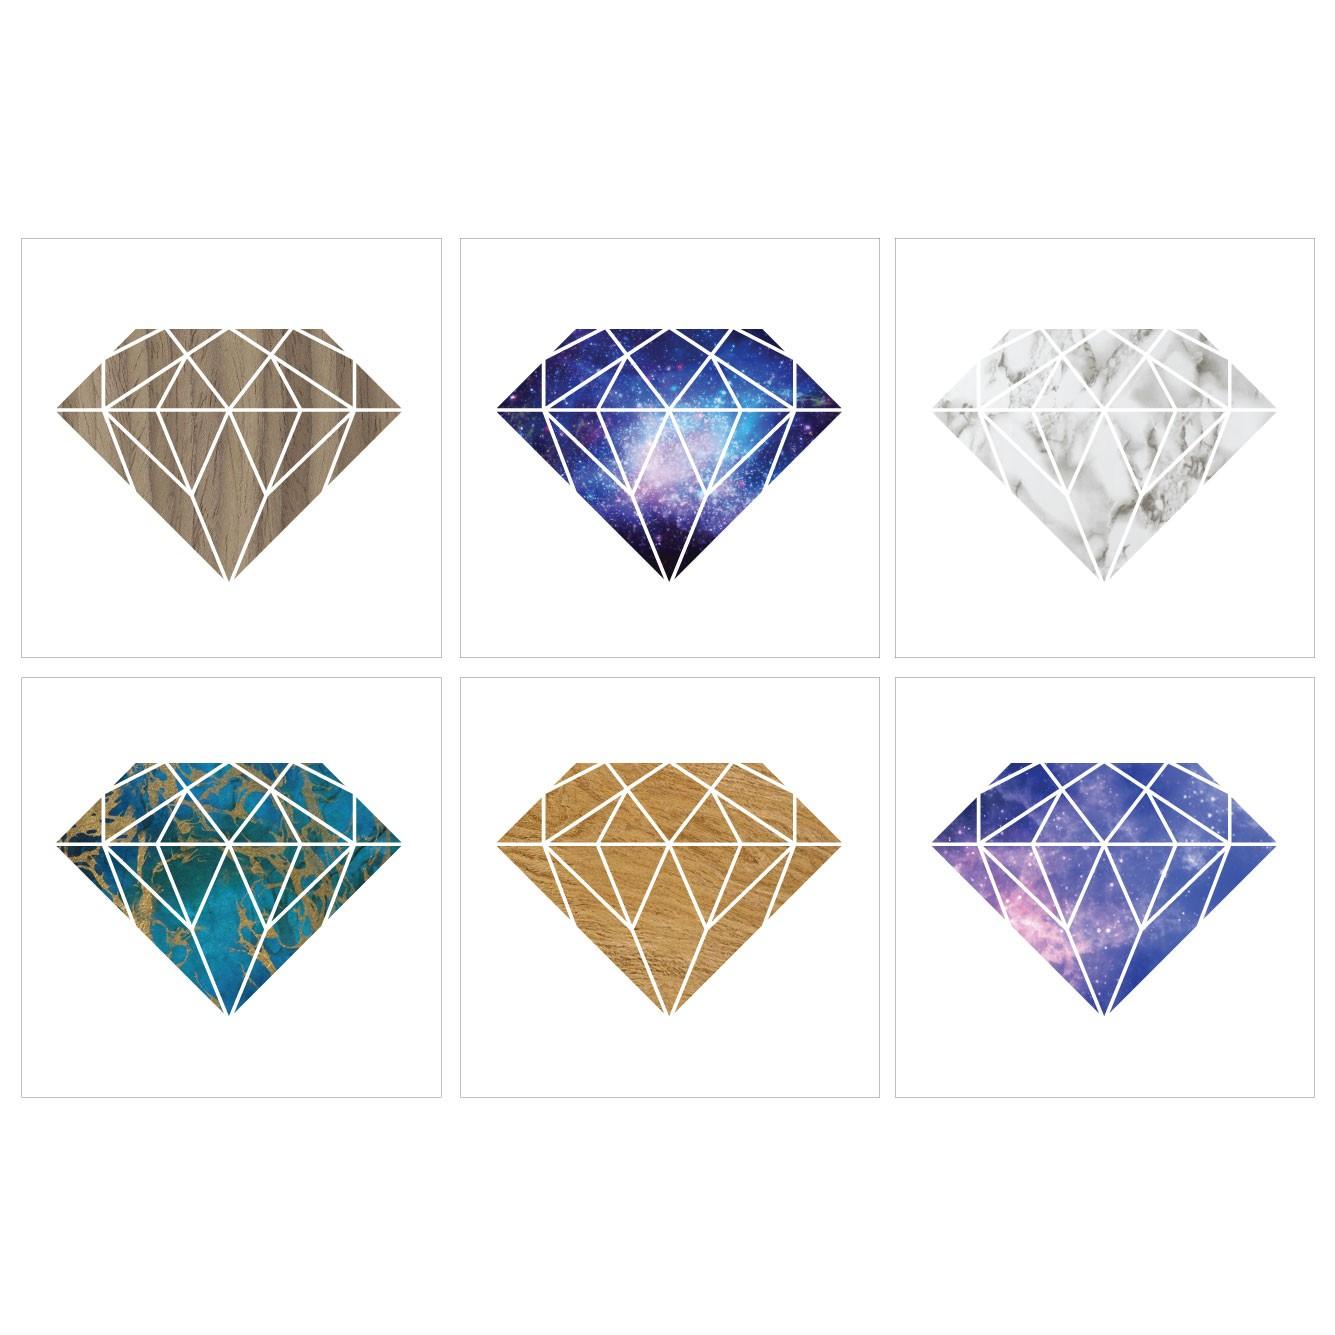 Kakeldekor 6st, Diamant